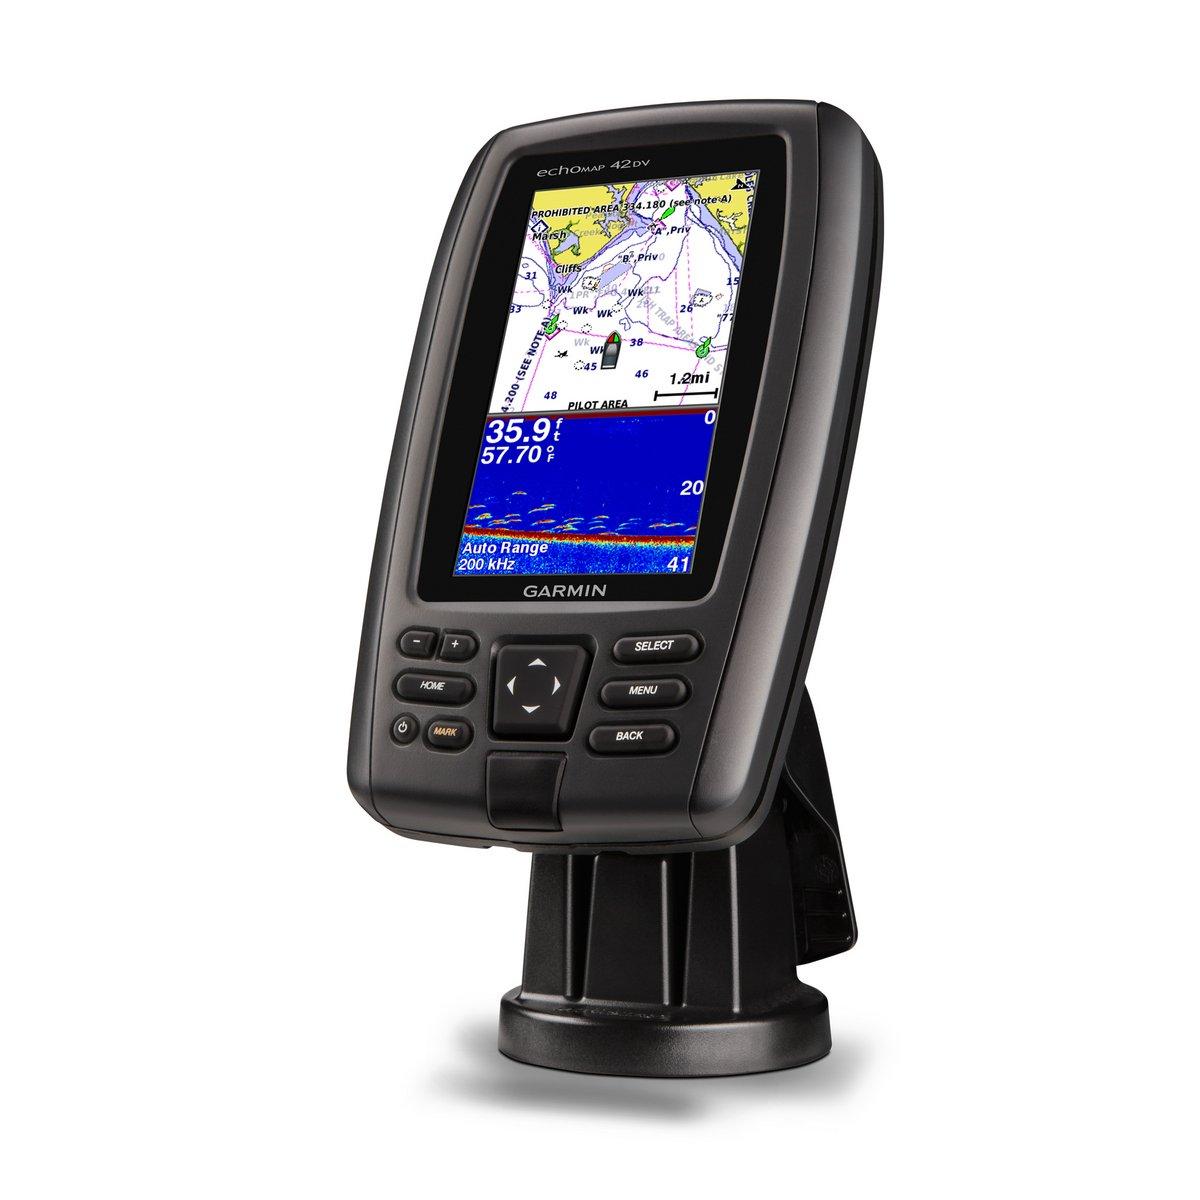 GPS Garmin 42dv